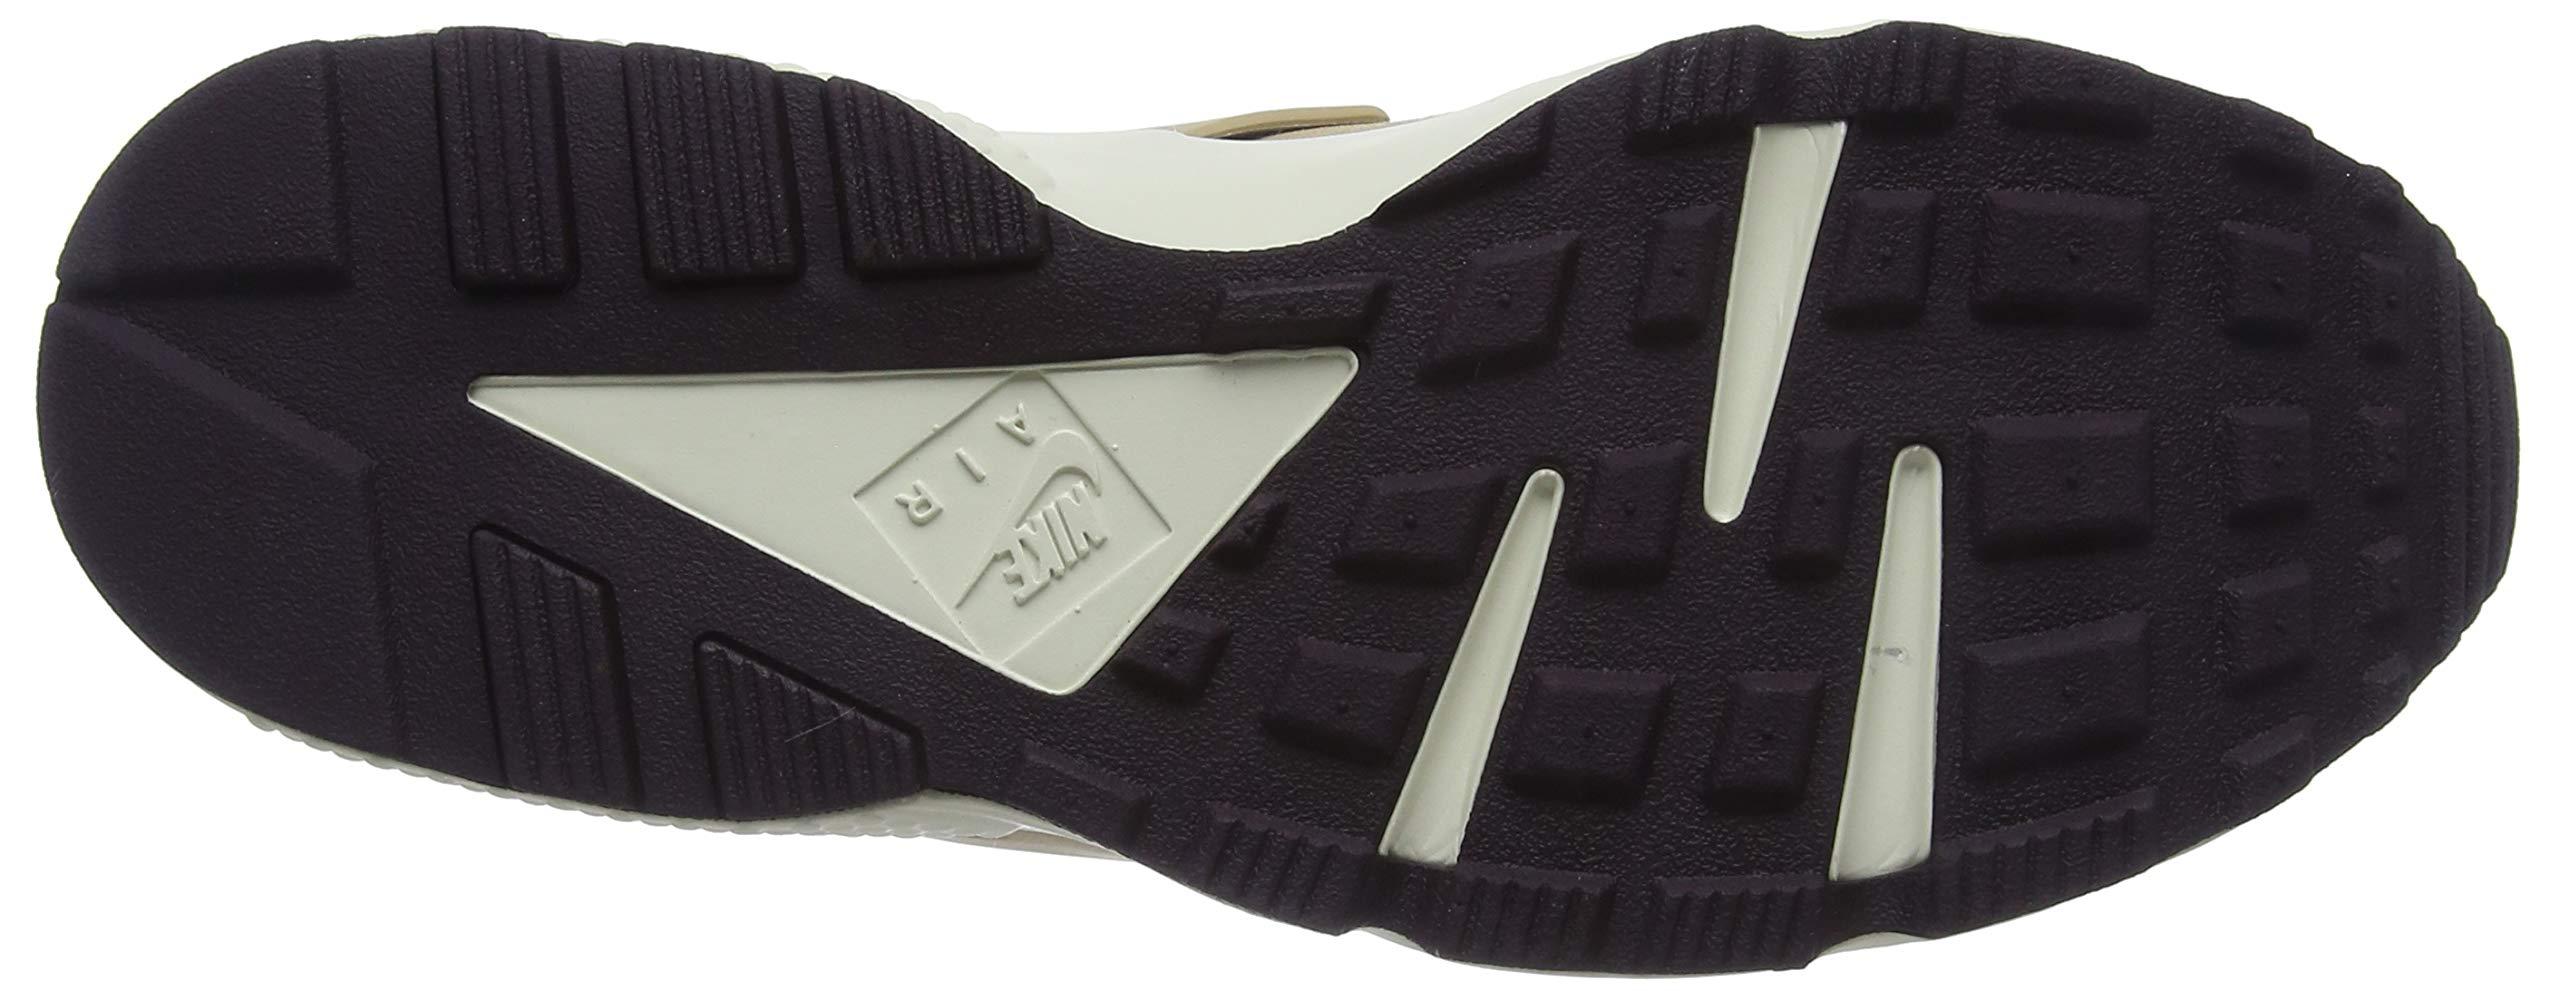 71pbuwY NQL - Nike Men's Air Huarache Run PRM Fitness Shoes